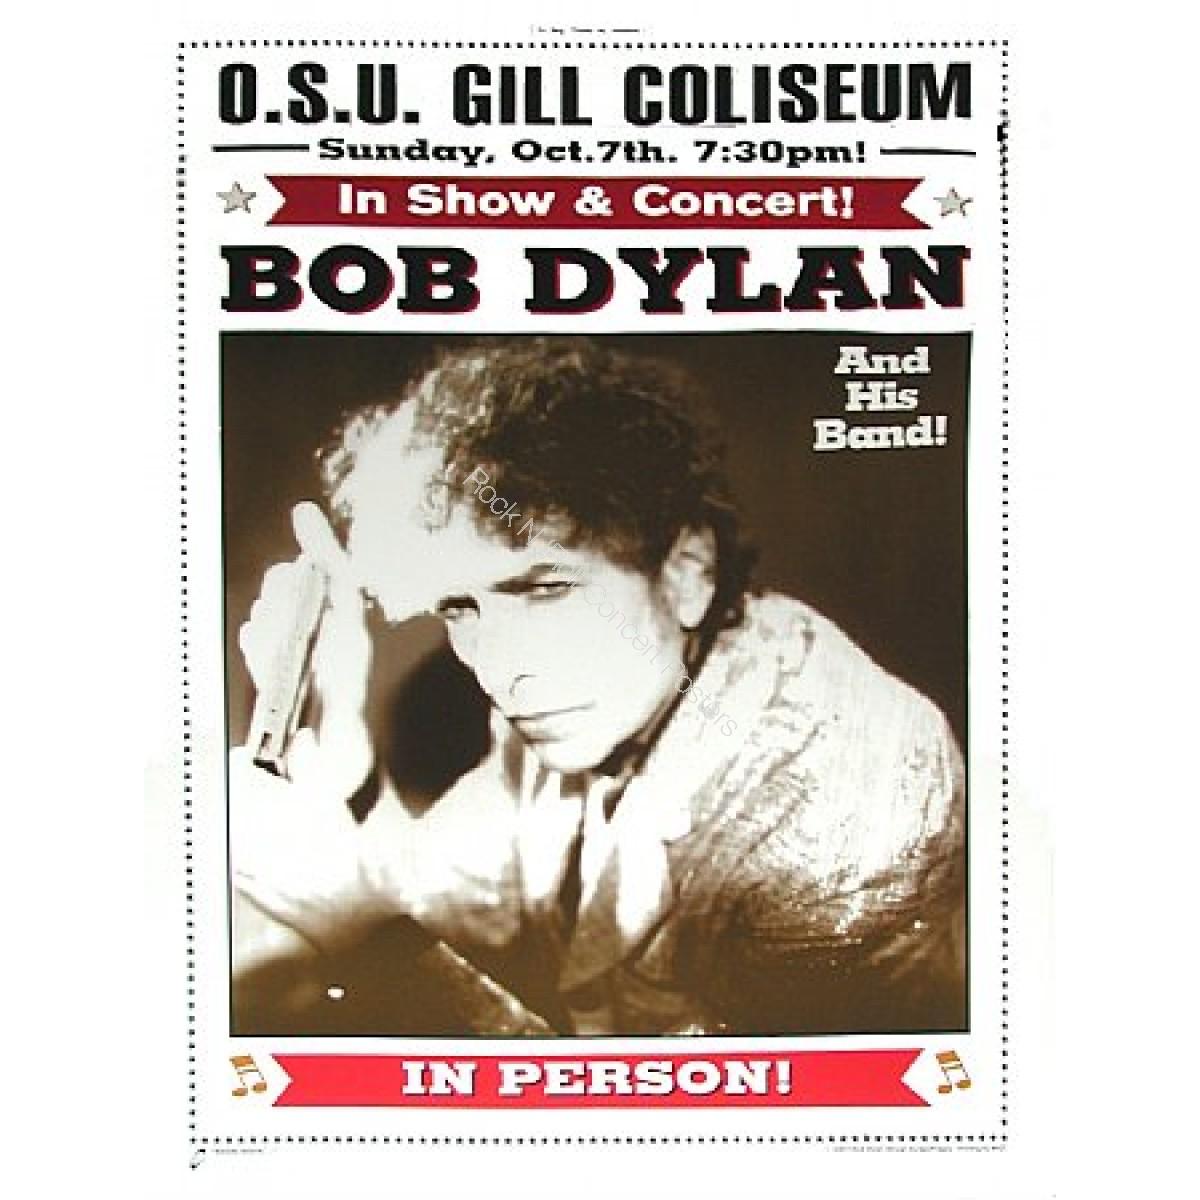 Bob Dylan & His Band  Gill Coliseum OSU